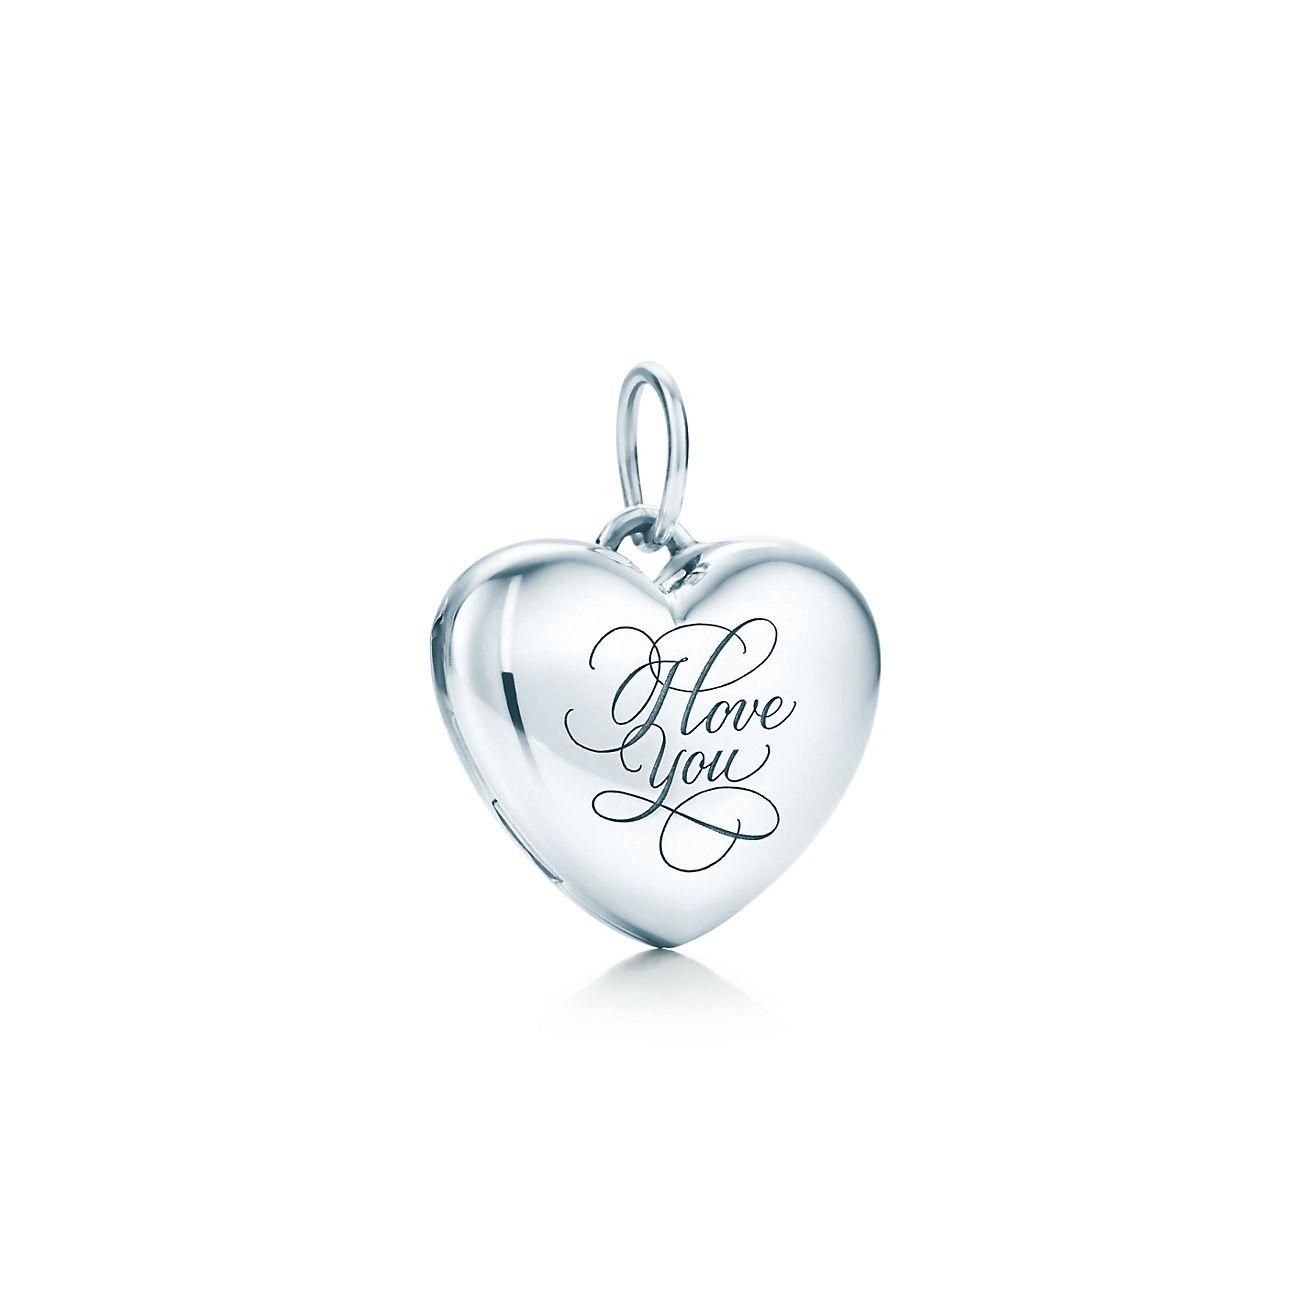 Tiffany Co. Browse Tiffany Lockets United States WishList Tiffany locket photo sizer